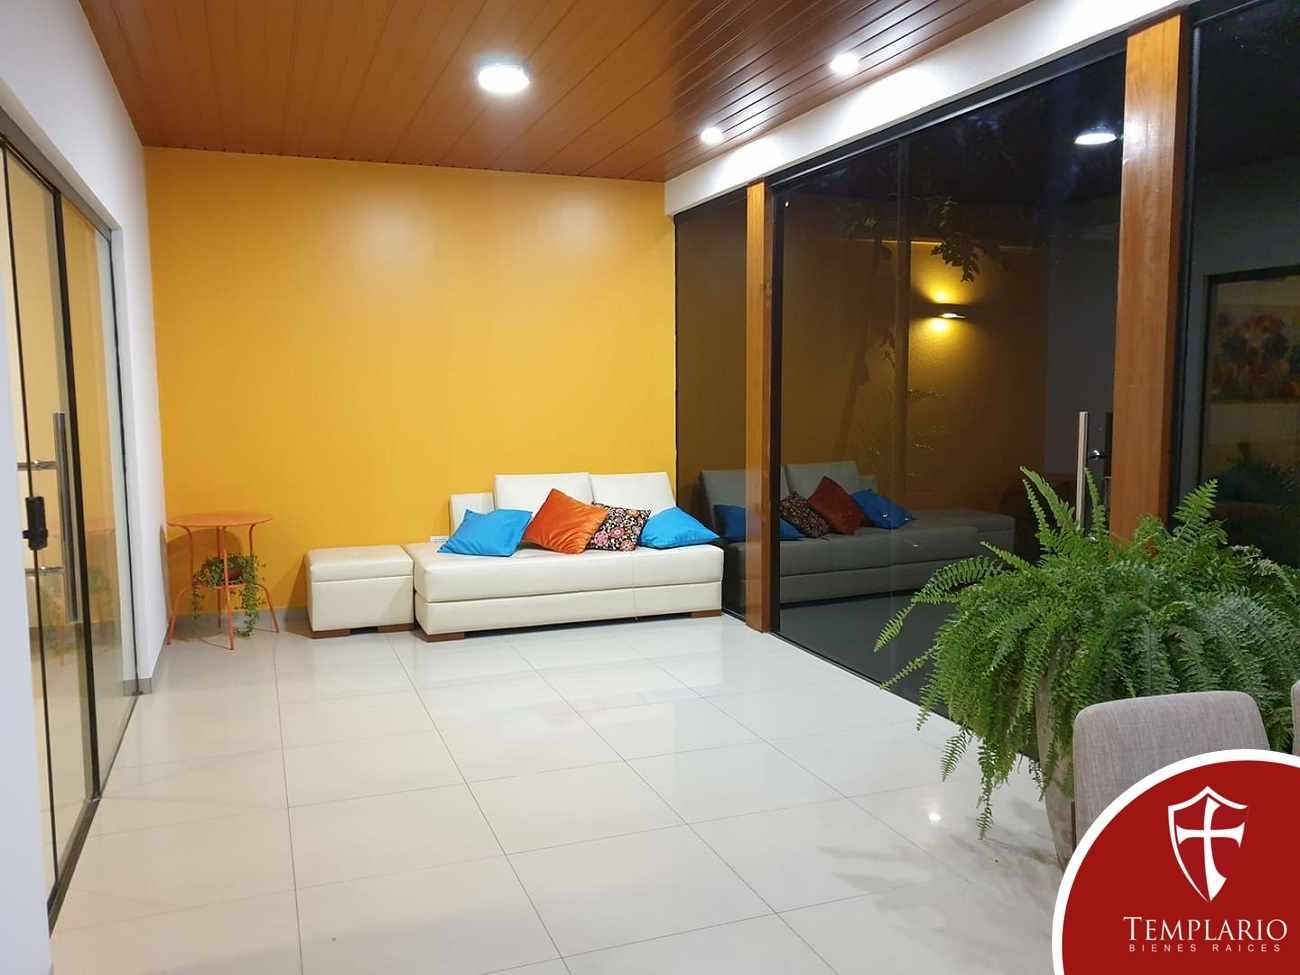 Casa en Venta Av. Beni 8vo Anillo - Zona Norte Foto 26